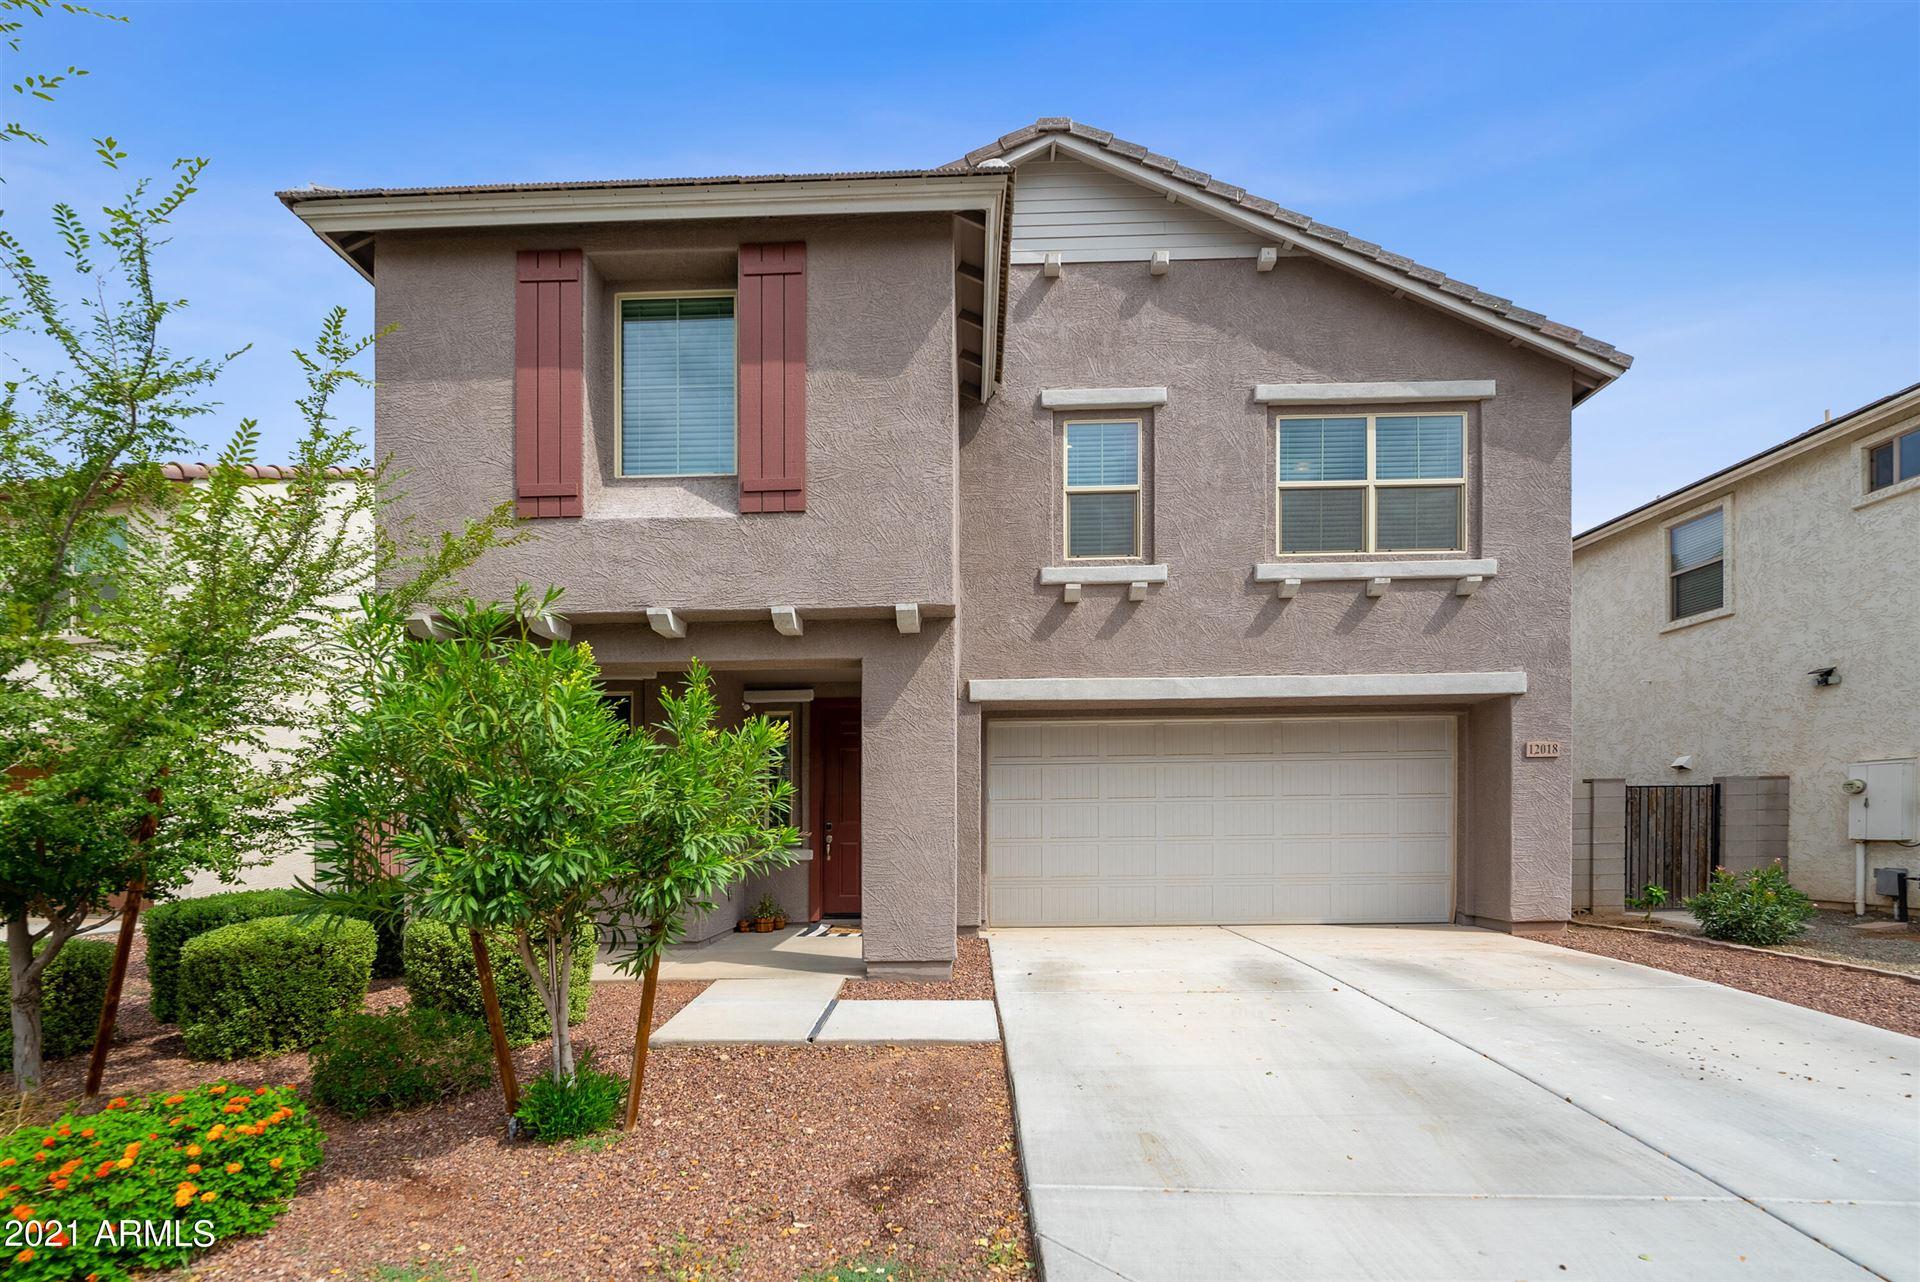 Photo of 12018 W TAYLOR Street, Avondale, AZ 85323 (MLS # 6267365)